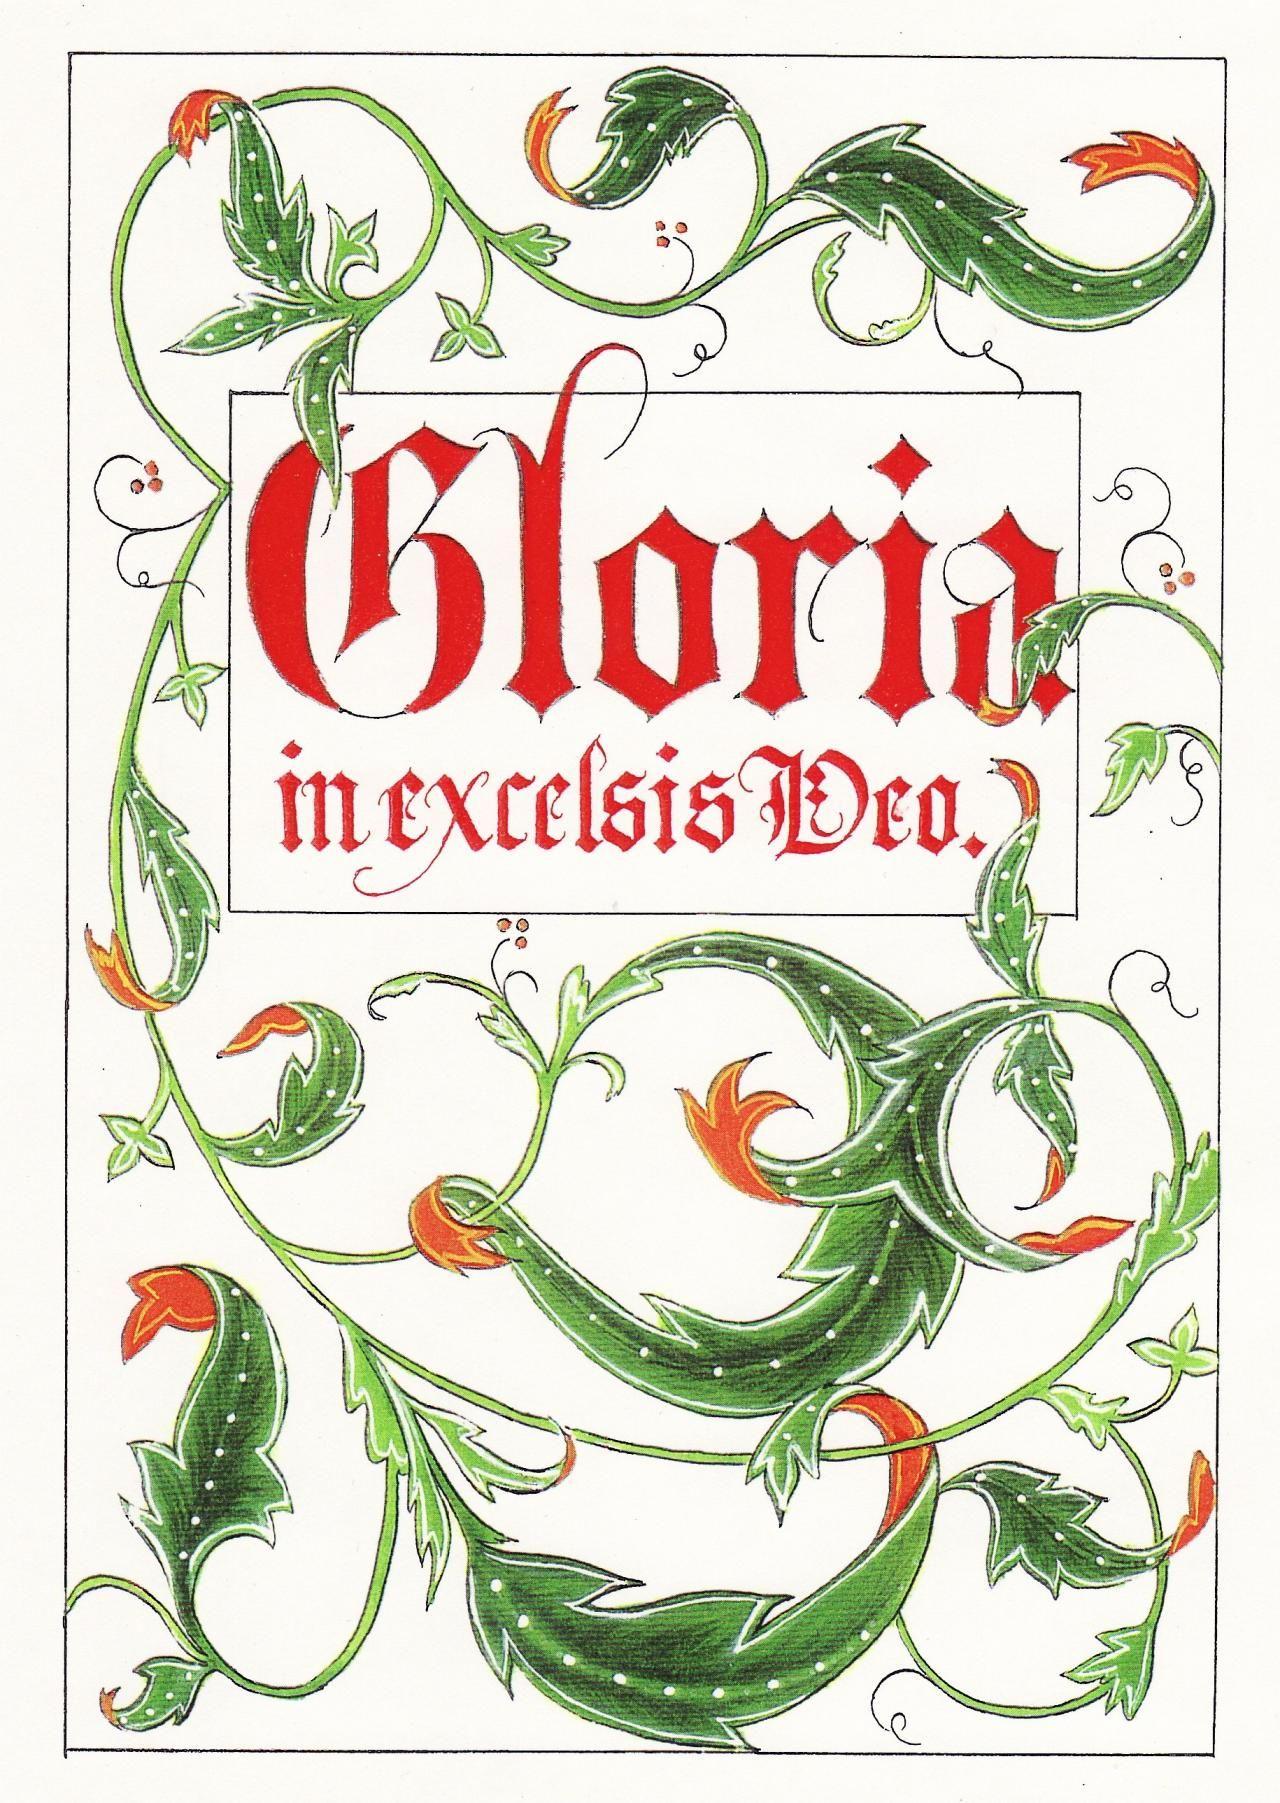 Gloria in Excelsis Deo | Gloria in excelsis deo, Christmas music, Jolly holiday